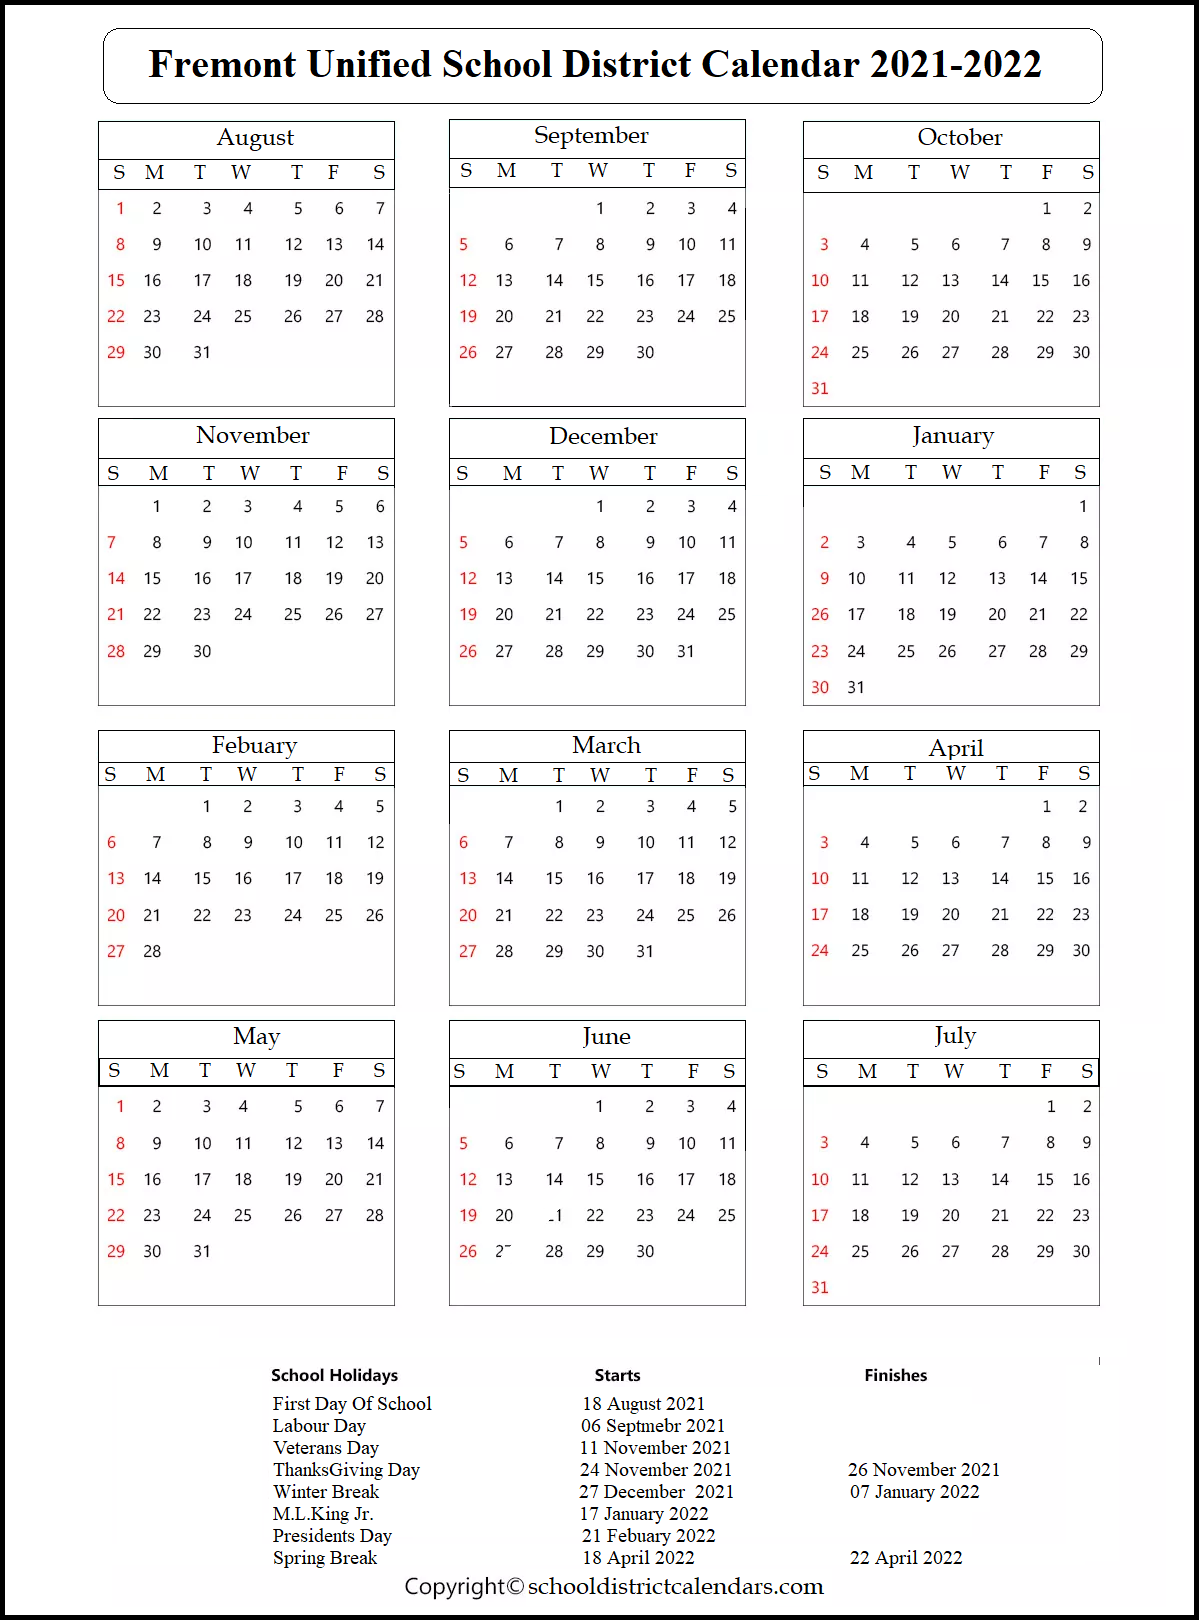 Fremont Unified School District Calendar